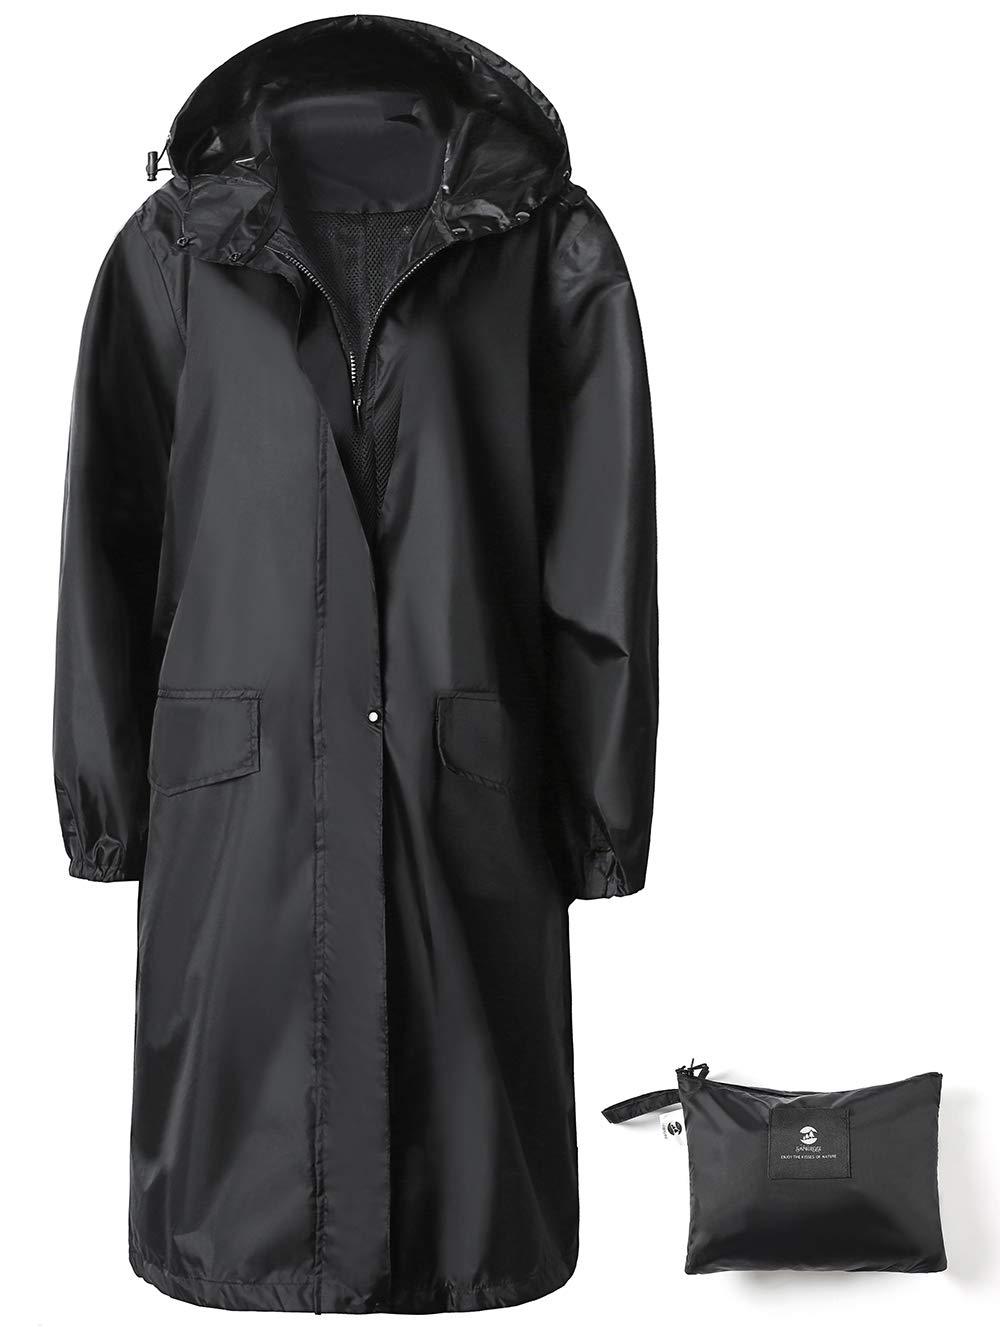 SaphiRose Womens Long Hooded Rain Jacket Waterproof Lightweight Raincoat Windbreaker